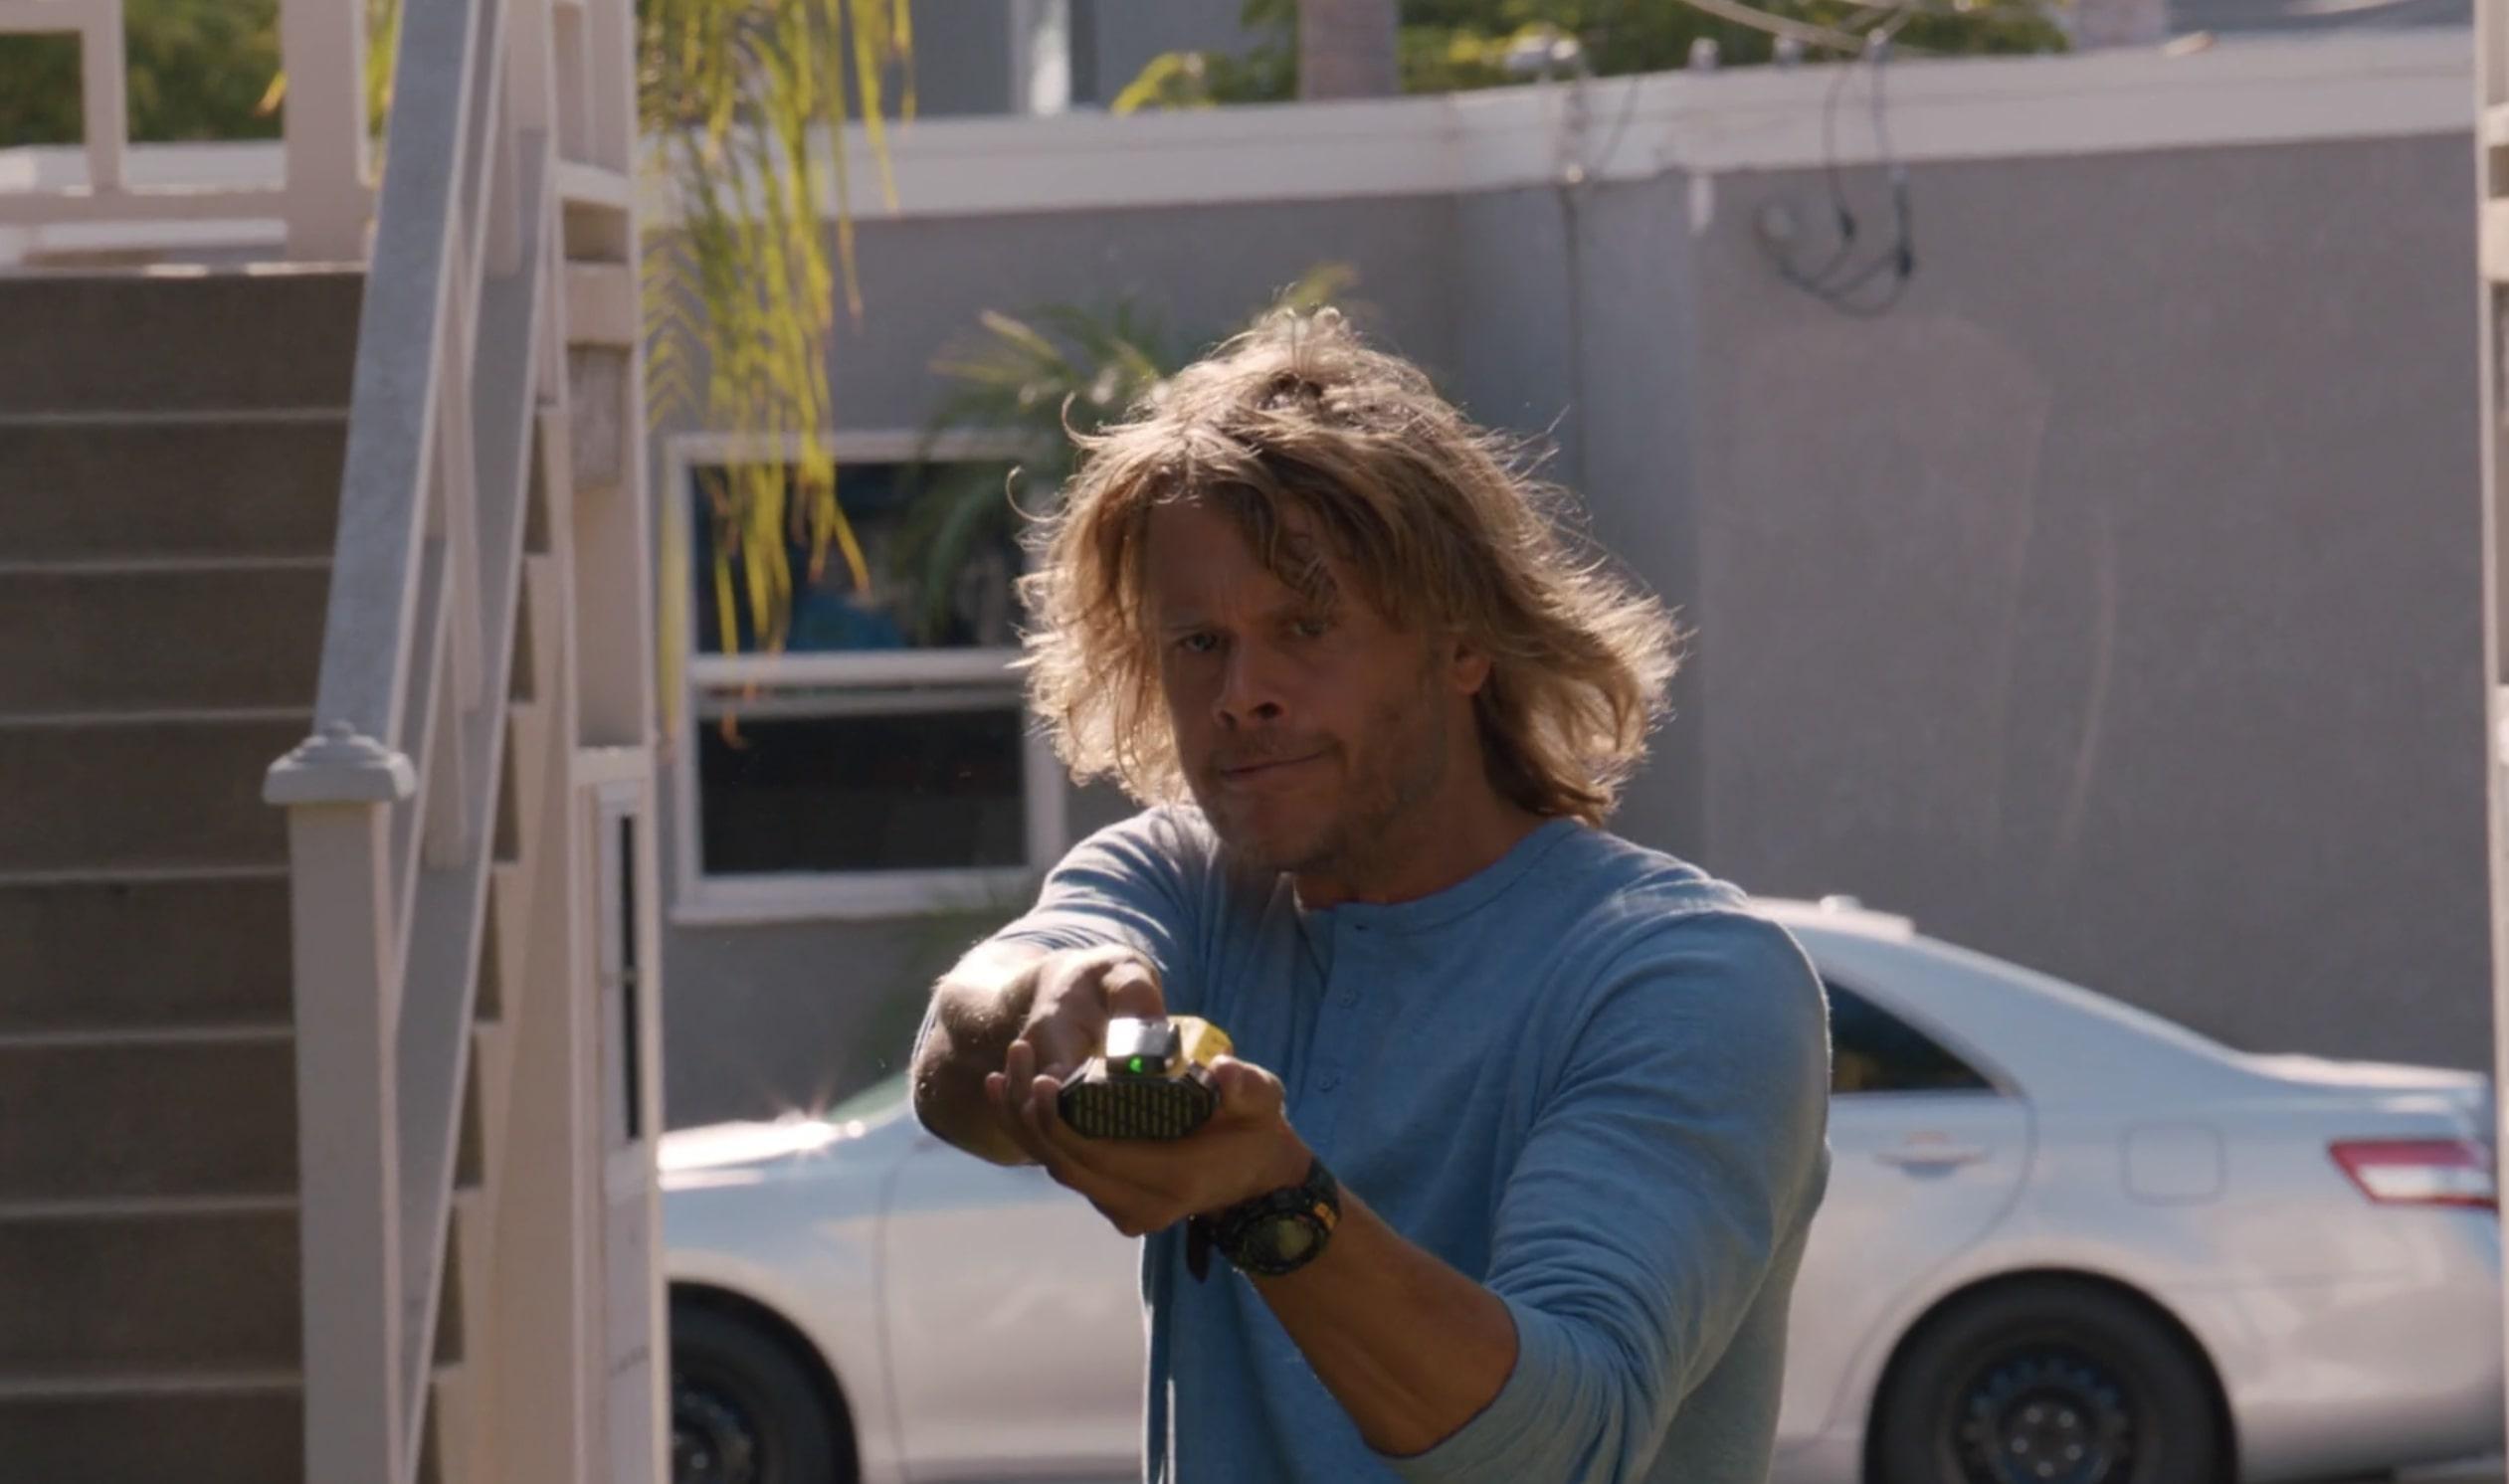 NCIS: Los Angeles on CBS, Season 11, Episode 7